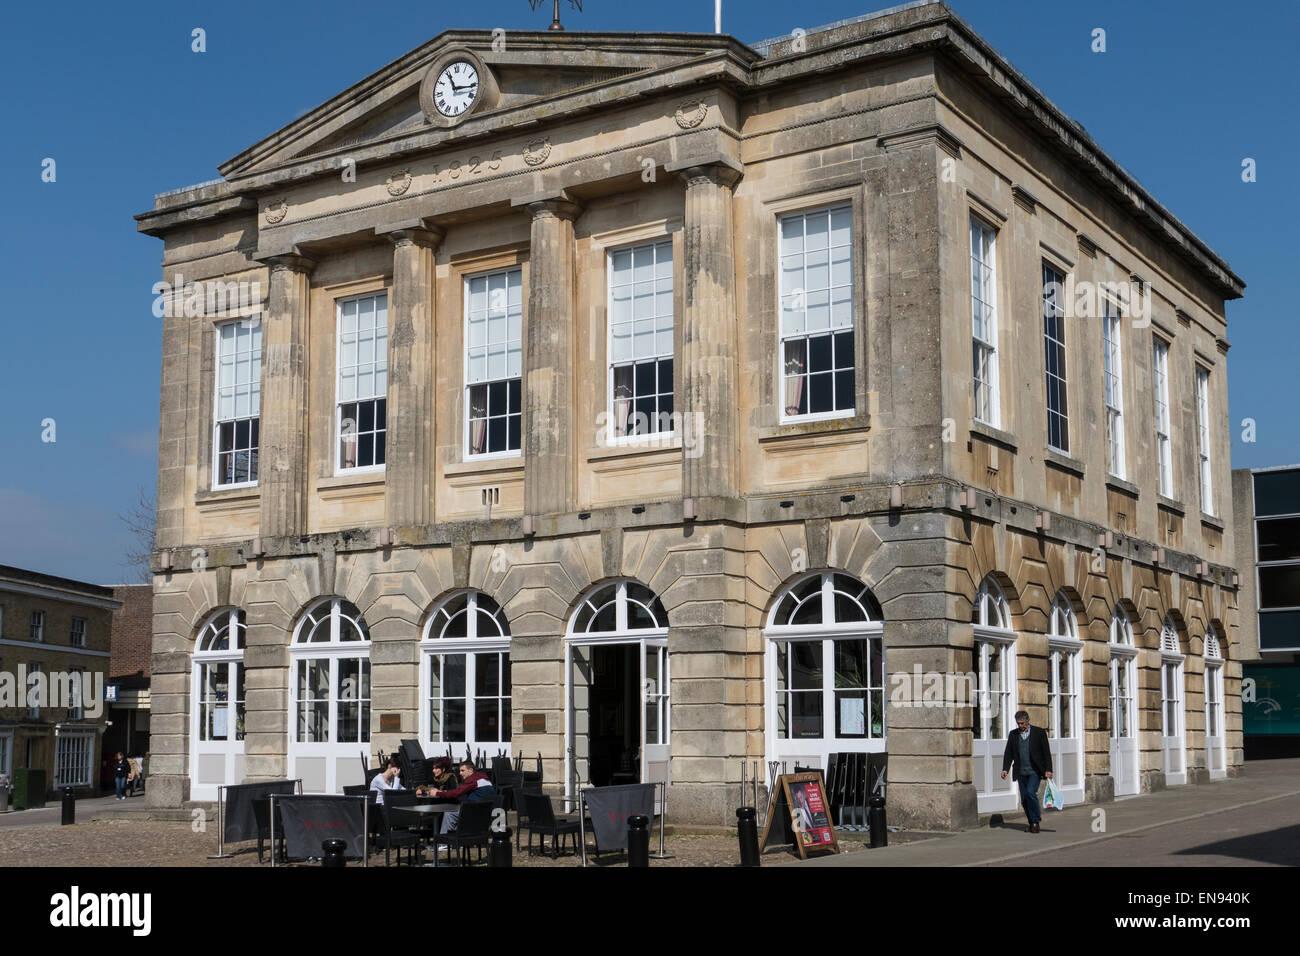 England, Hampshire, Andover, Town hall - Stock Image